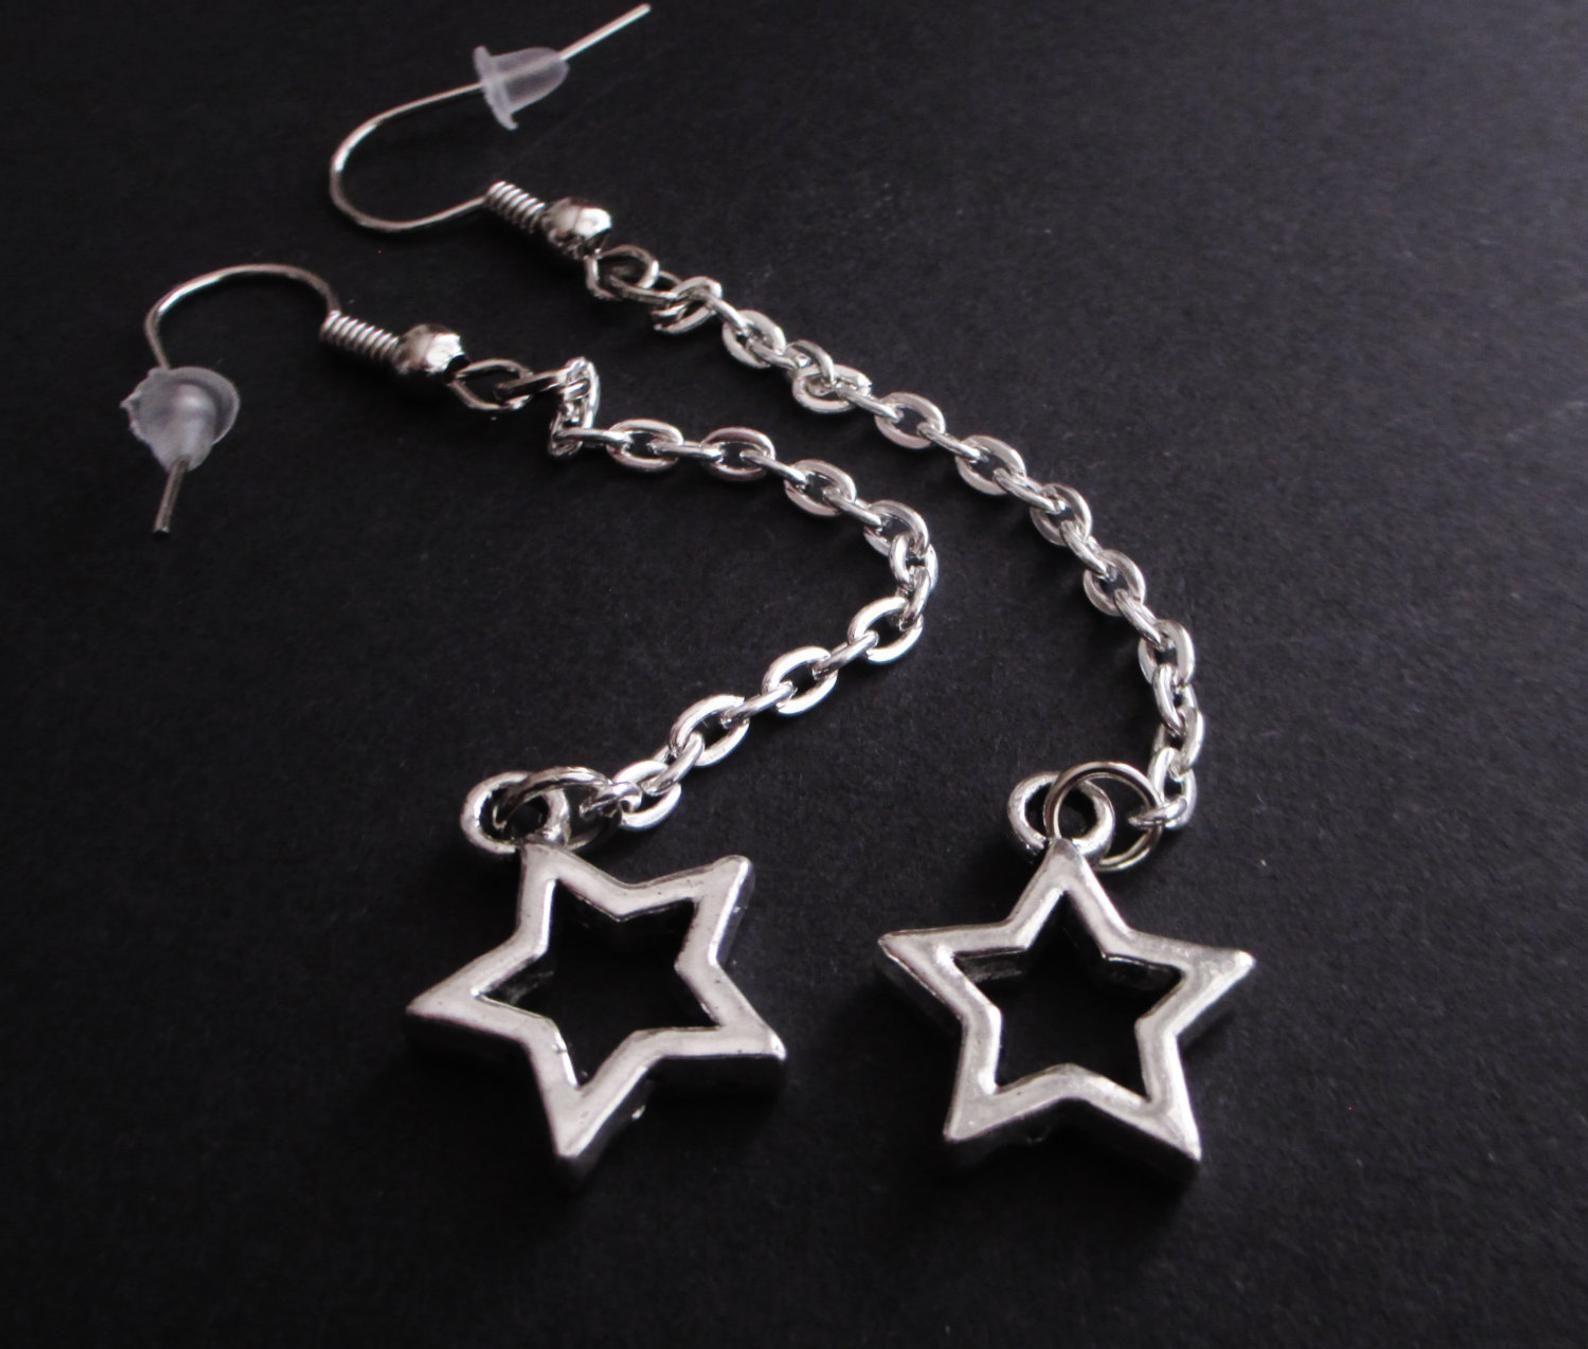 Holographic bracelet festival jewelry festival bracelet witch jewelry gothic bracelet witch Iridescent bracelet gothic jewelry